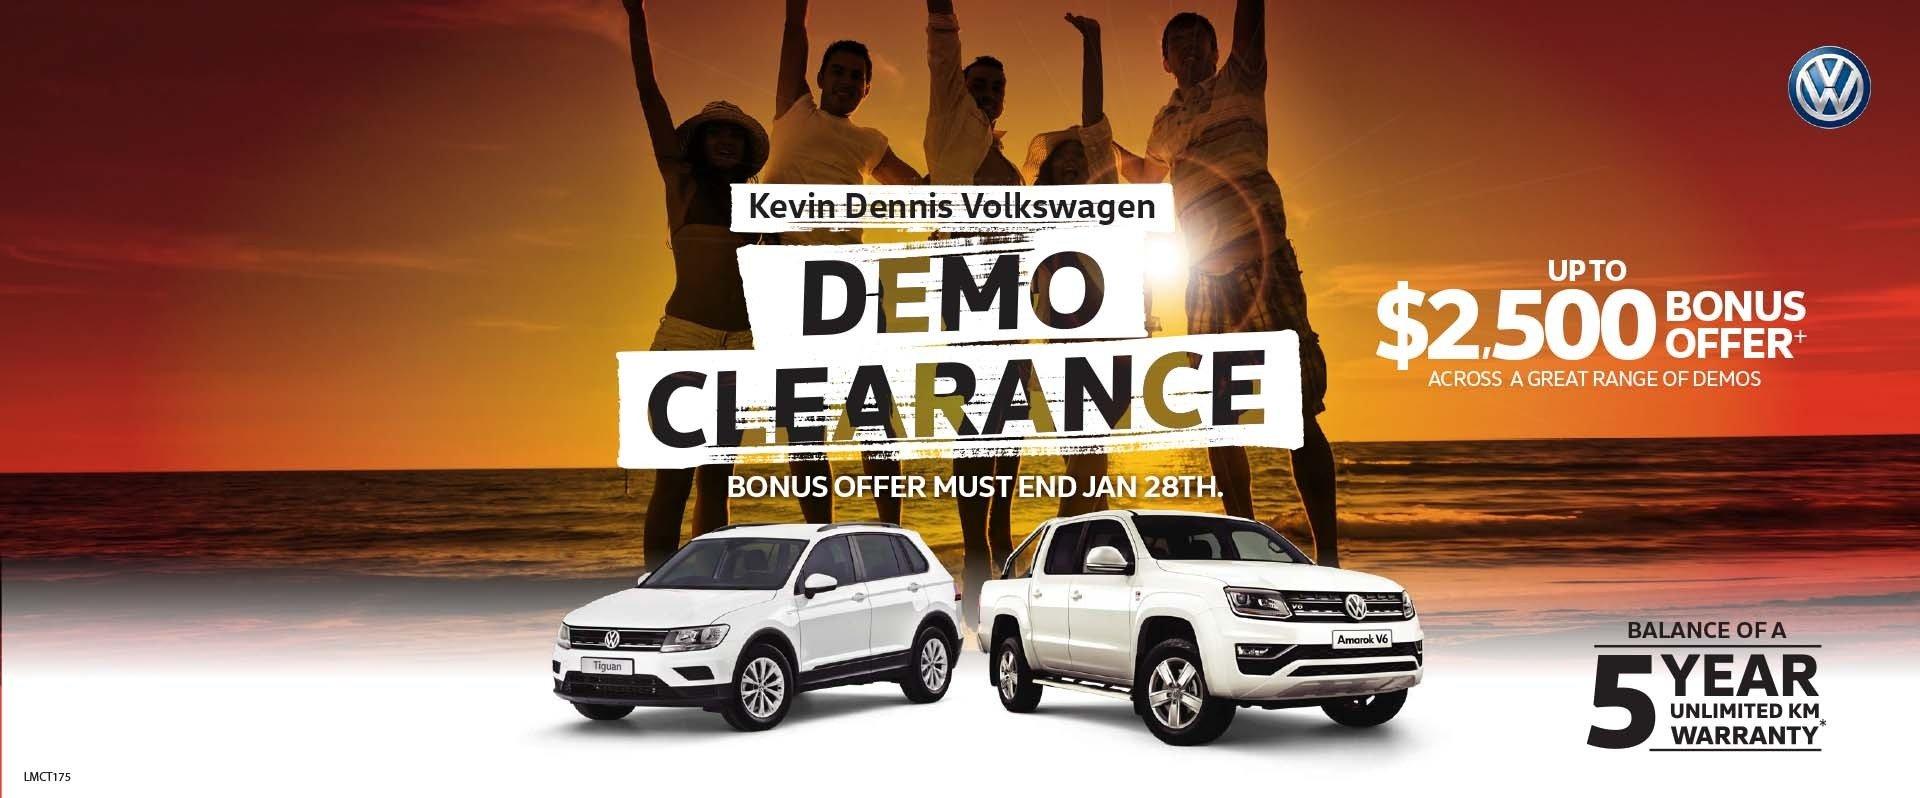 Kevin Dennis VW - Demo Clearance Sale